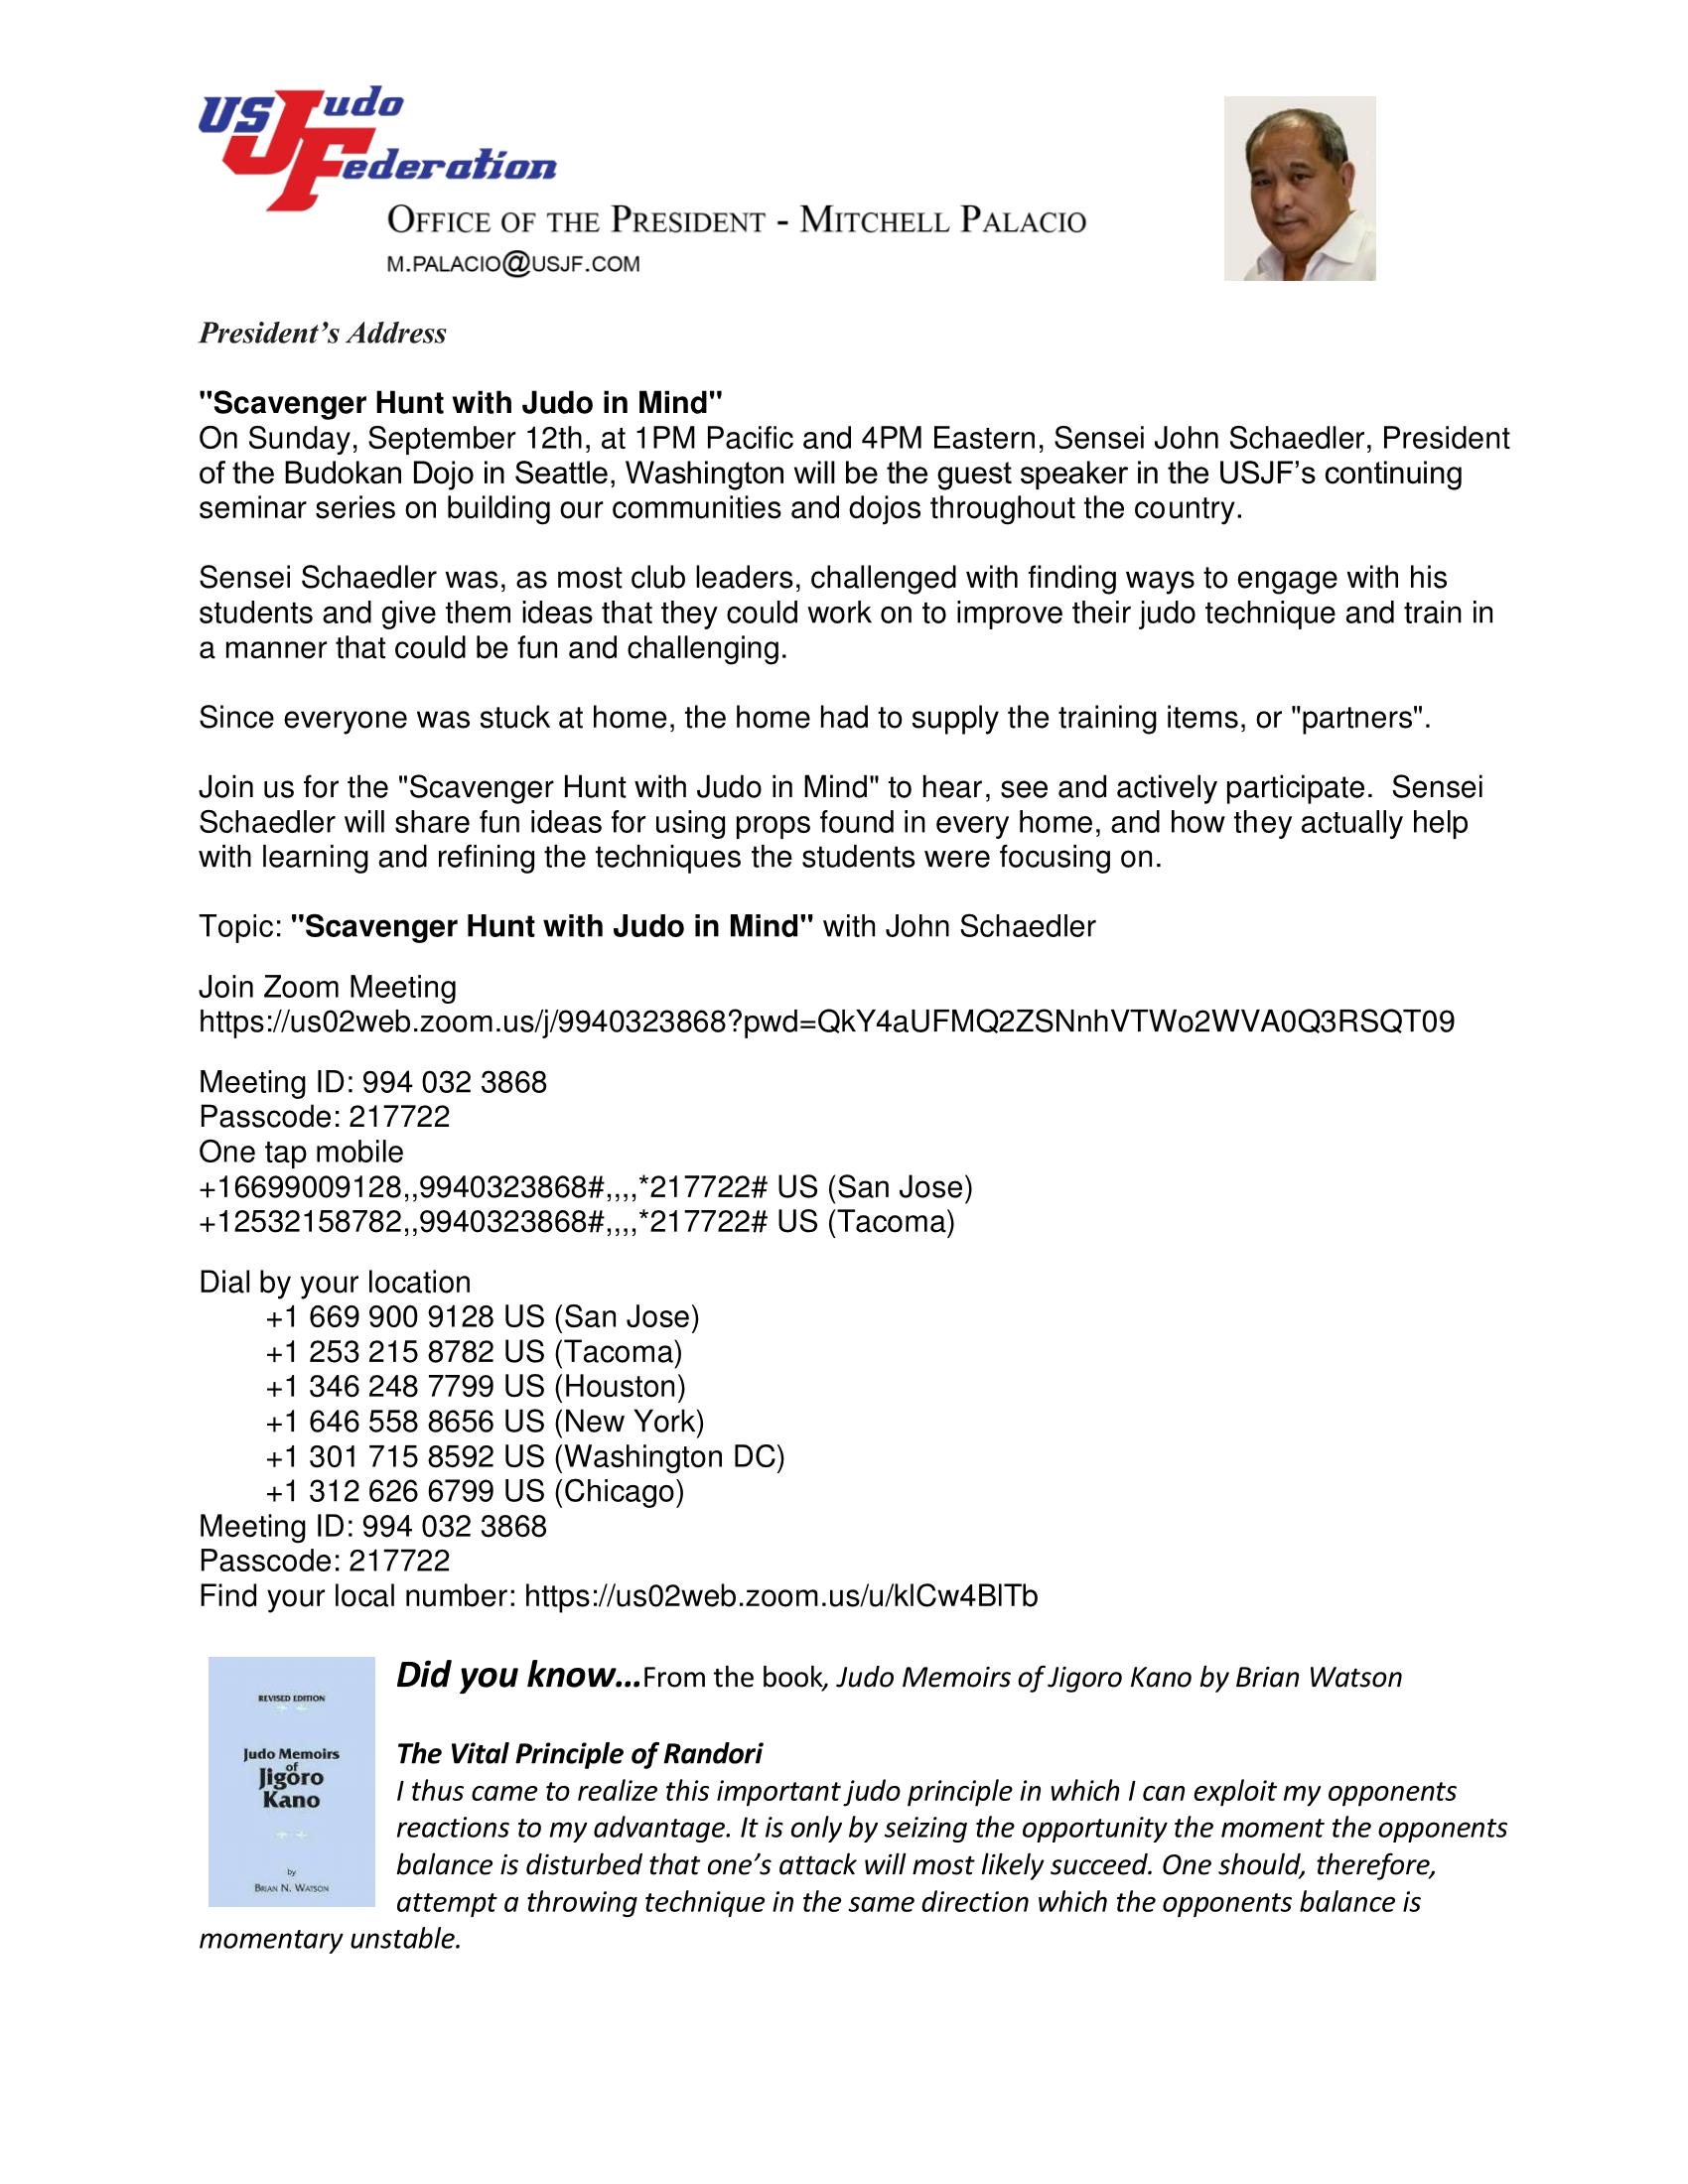 image of pdf announcement